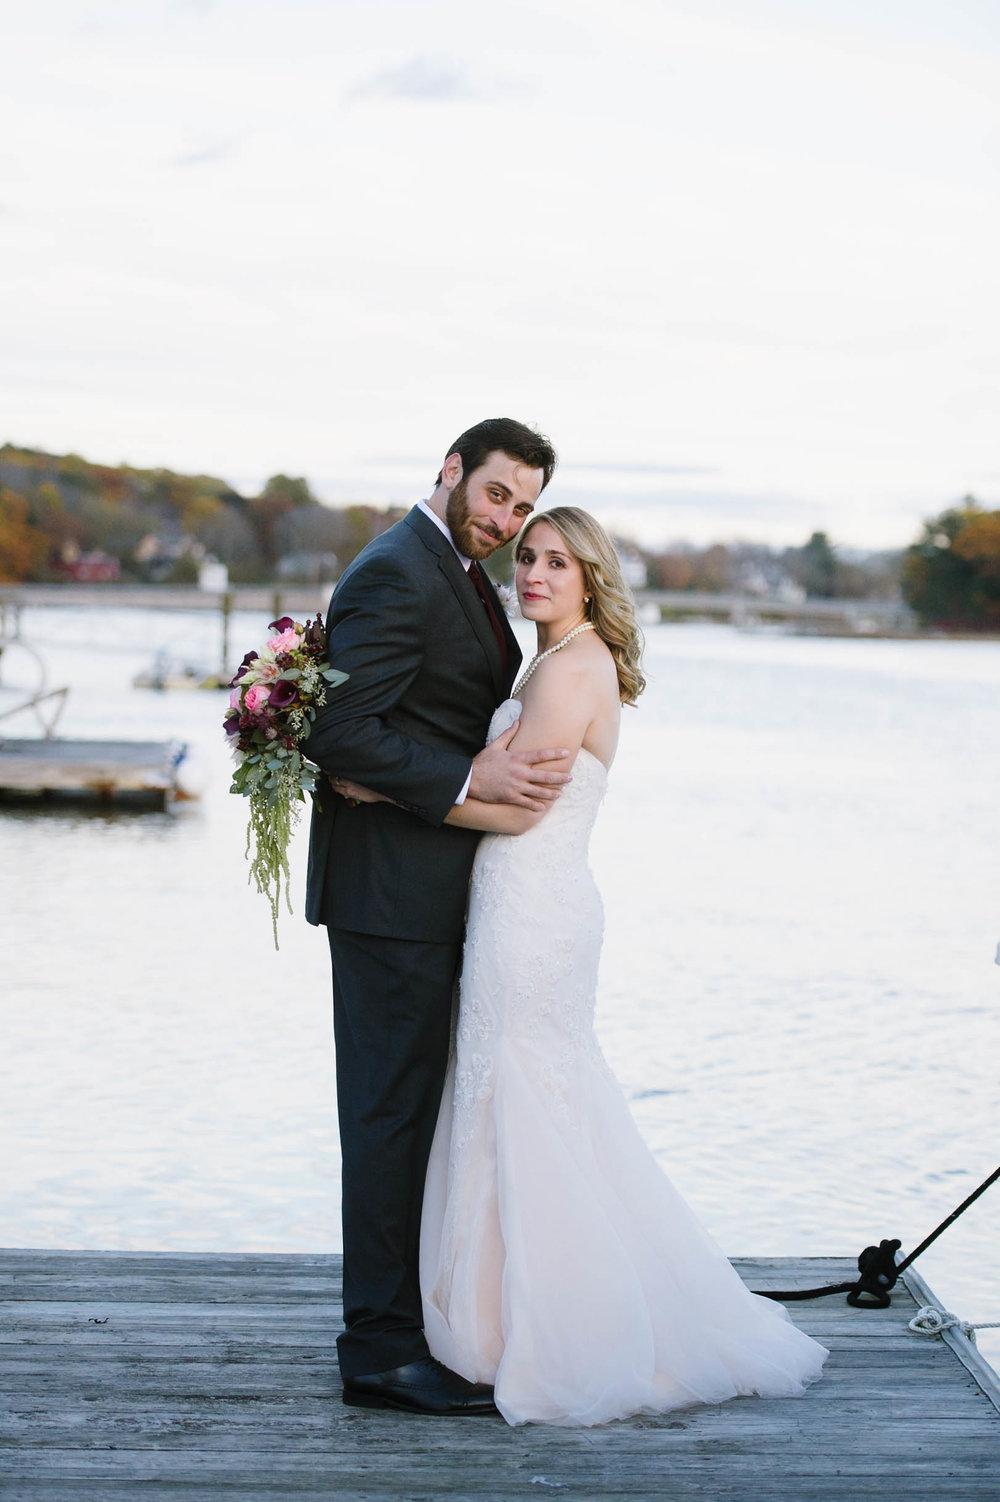 Masschusetts-Creative-Wedding02.jpg